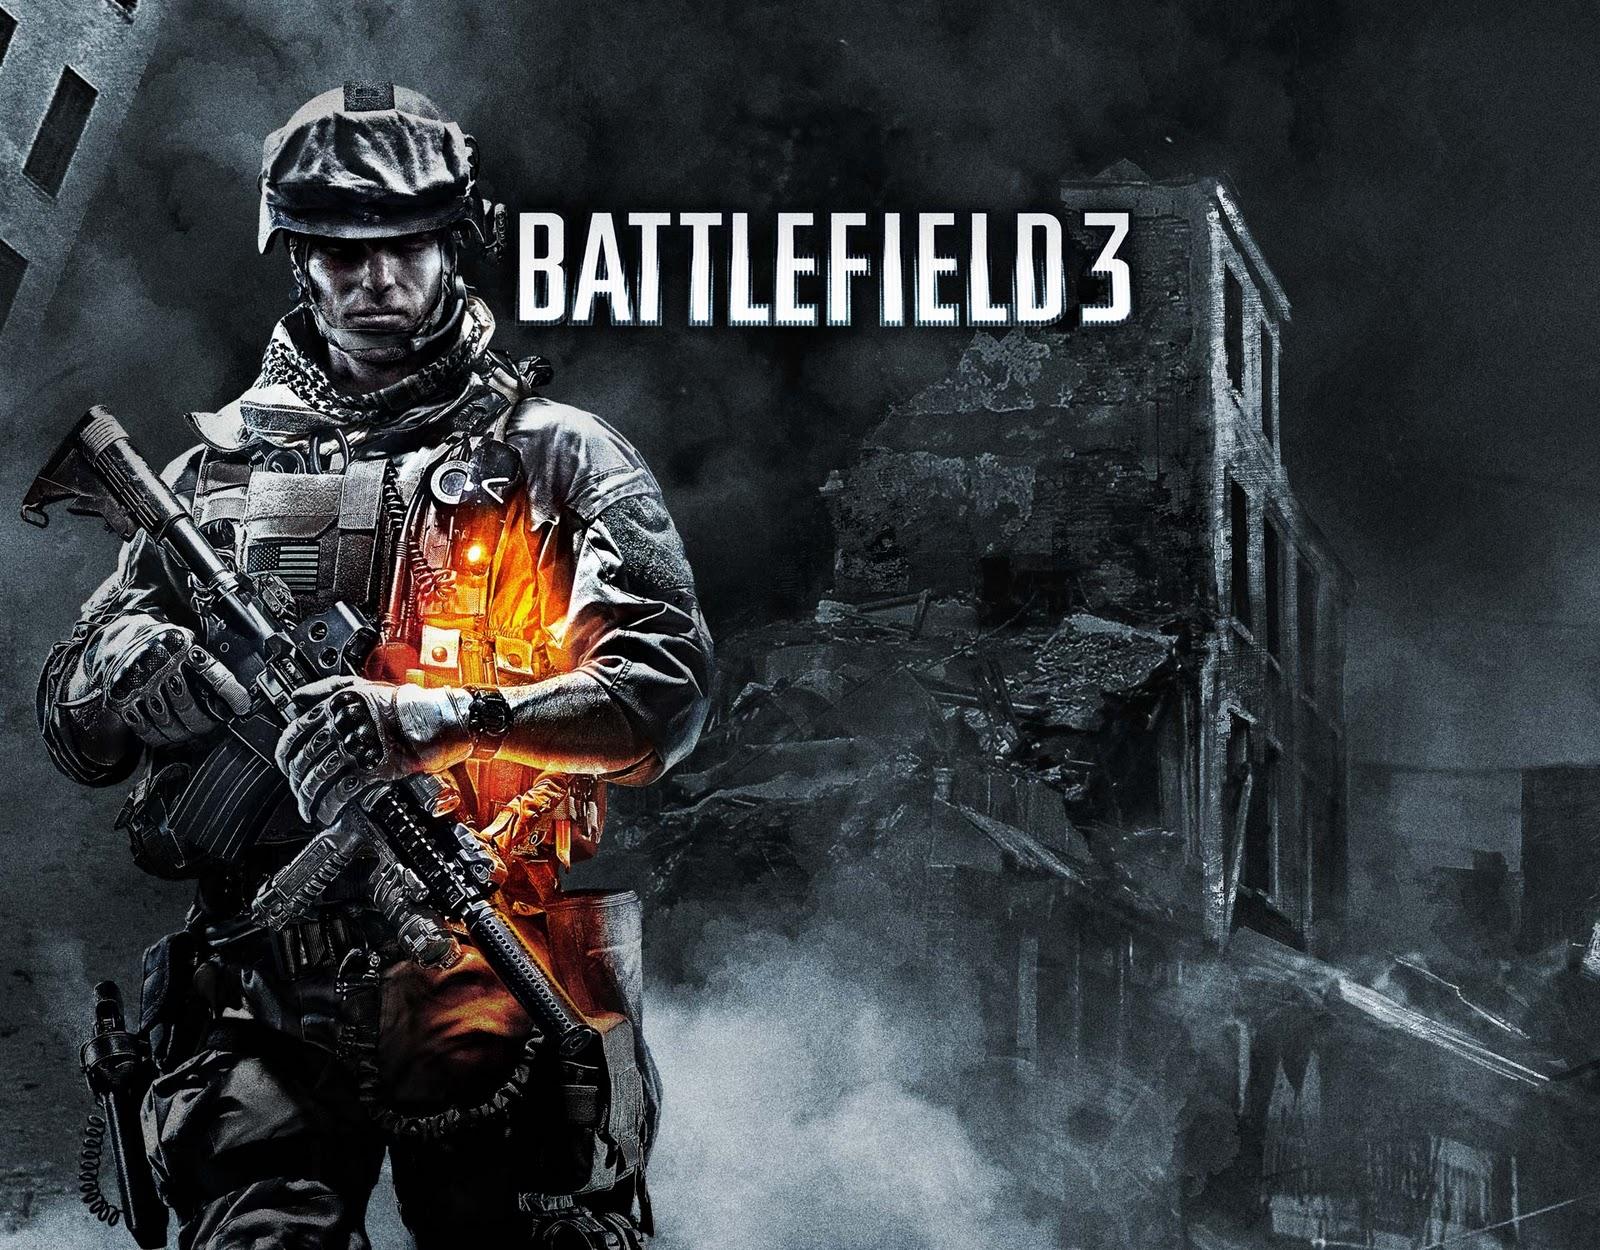 http://4.bp.blogspot.com/-uumDCKw_i2E/ToMai5ZP5KI/AAAAAAAAAxs/_OwlJfjQoeY/s1600/jfk+Battlefield-3-Wallpaper-.jpg